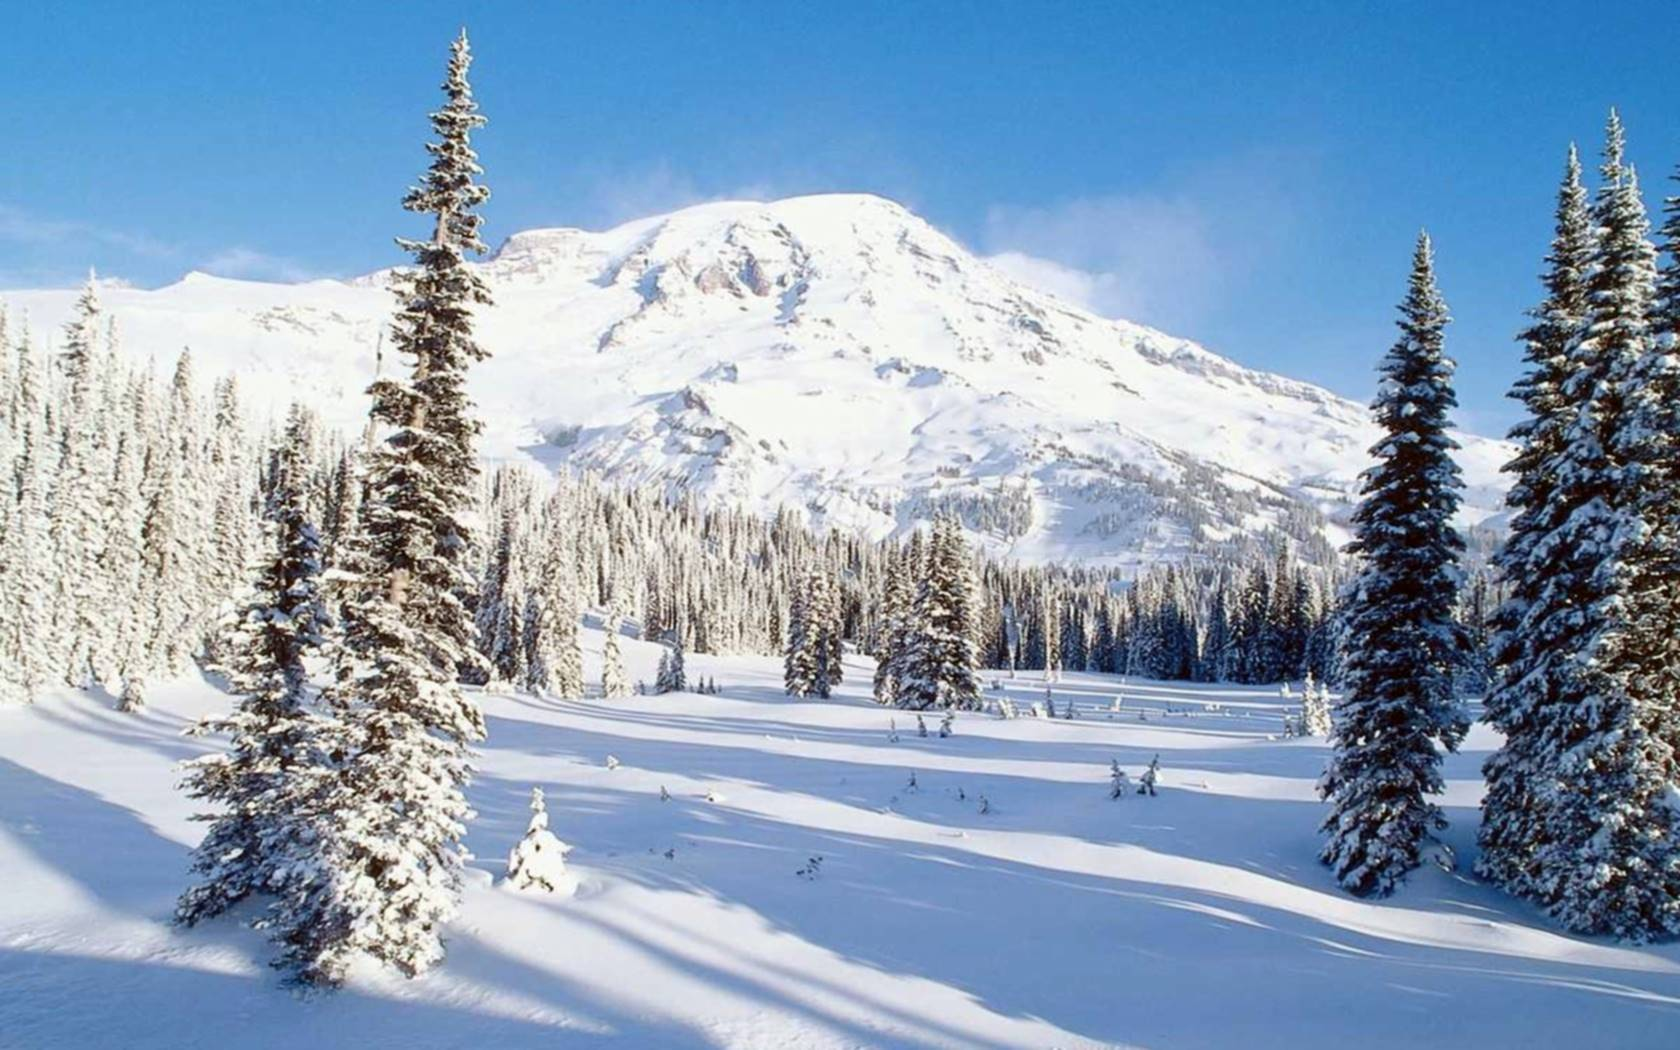 pin winter winterlandschaften als hd hintergrundbilder wunderschoene on pinterest. Black Bedroom Furniture Sets. Home Design Ideas